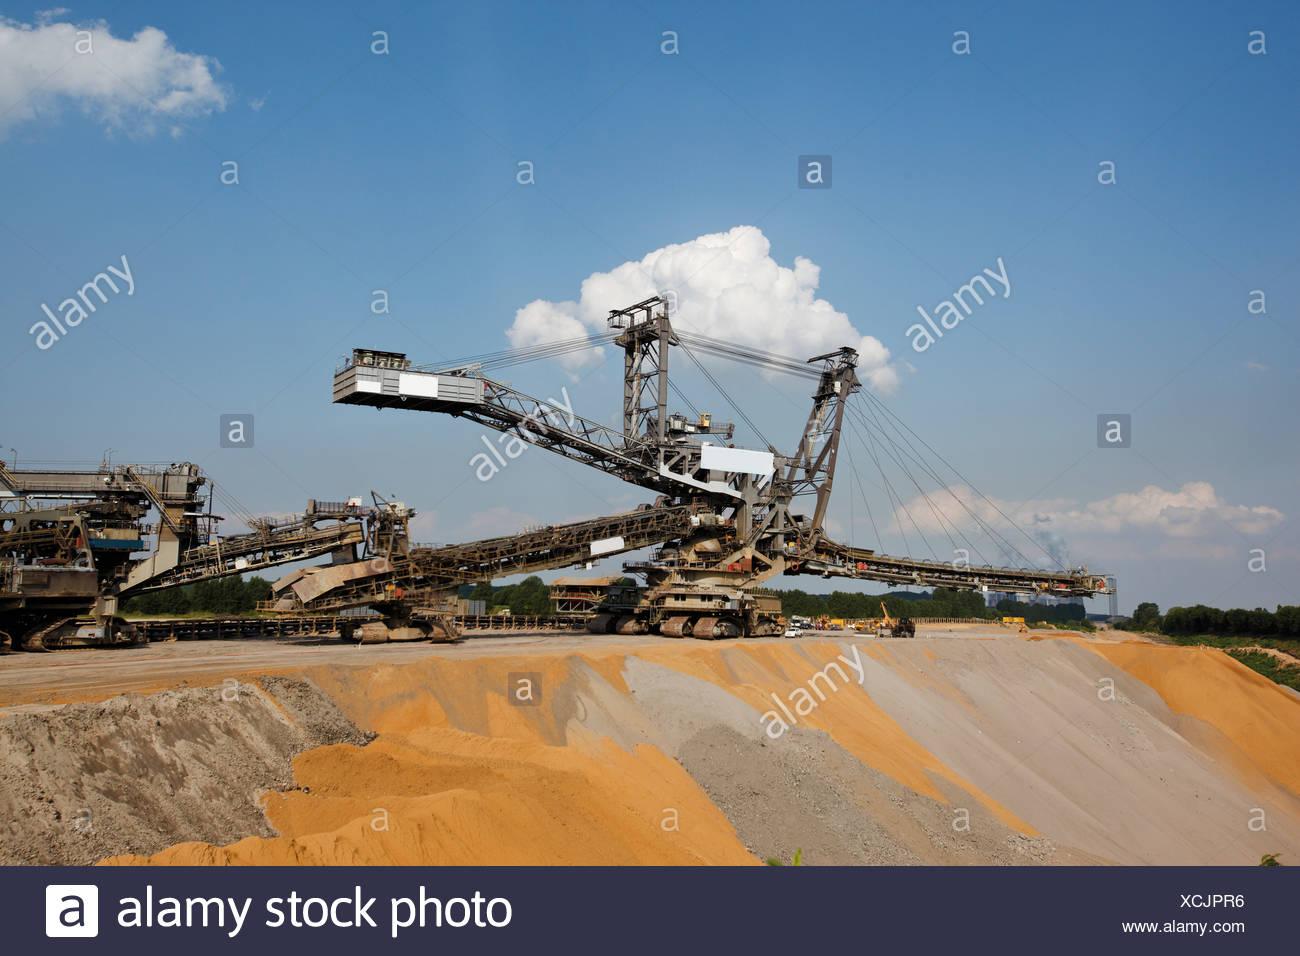 Germany, North Rhine-Westphalia, Glesch, Brown coal surface mining Stock Photo